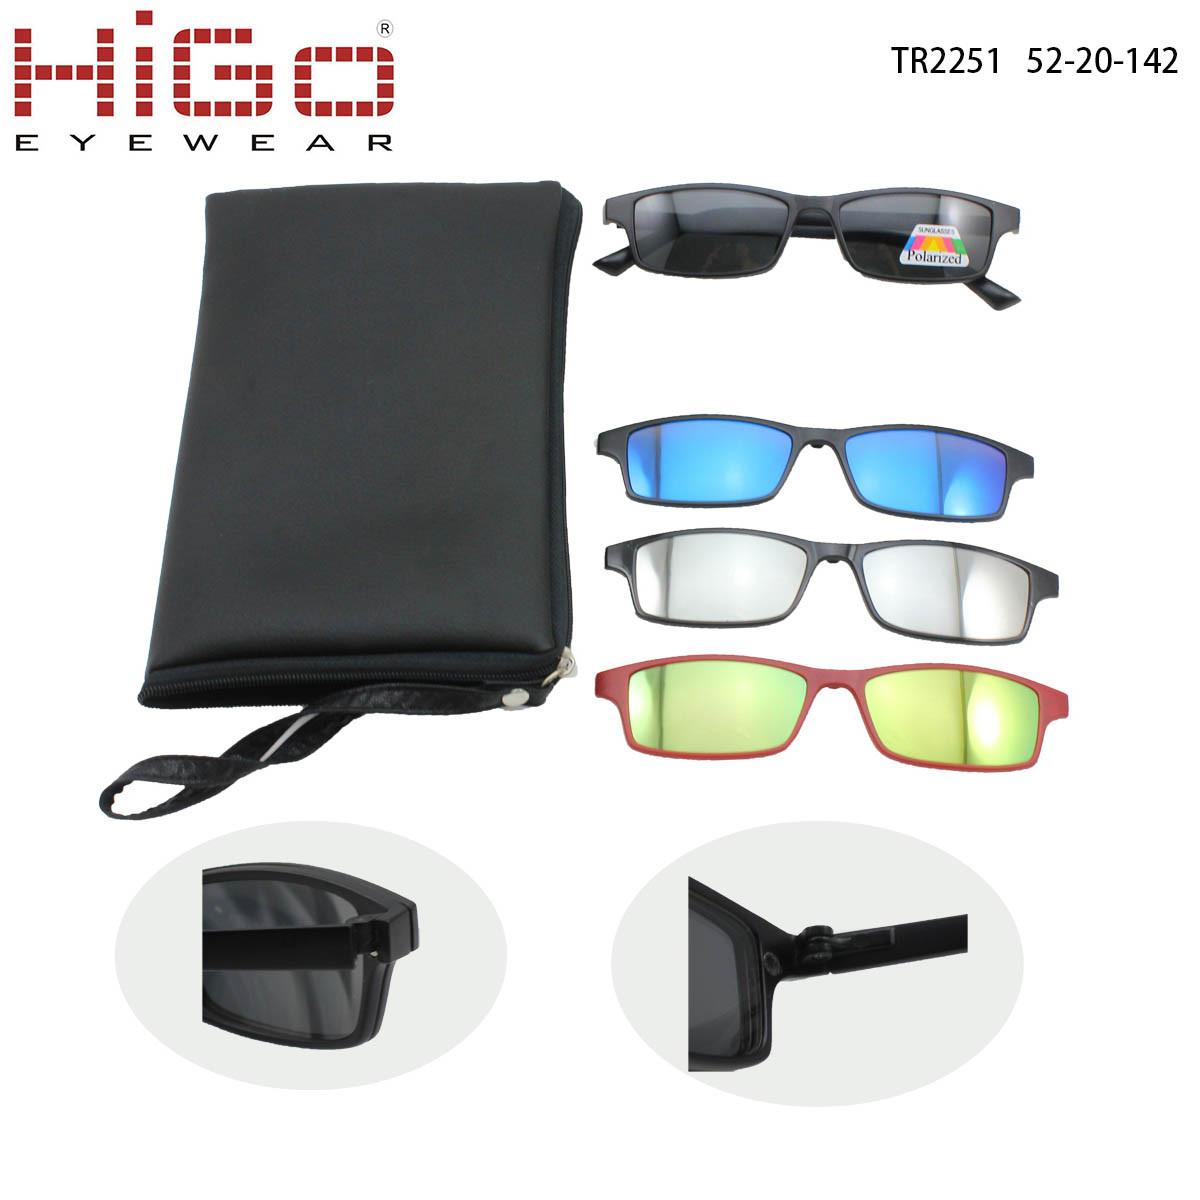 China Tr90 Glasses 1 Frame Polarized 4 Clip on Sunglasses Photos ...